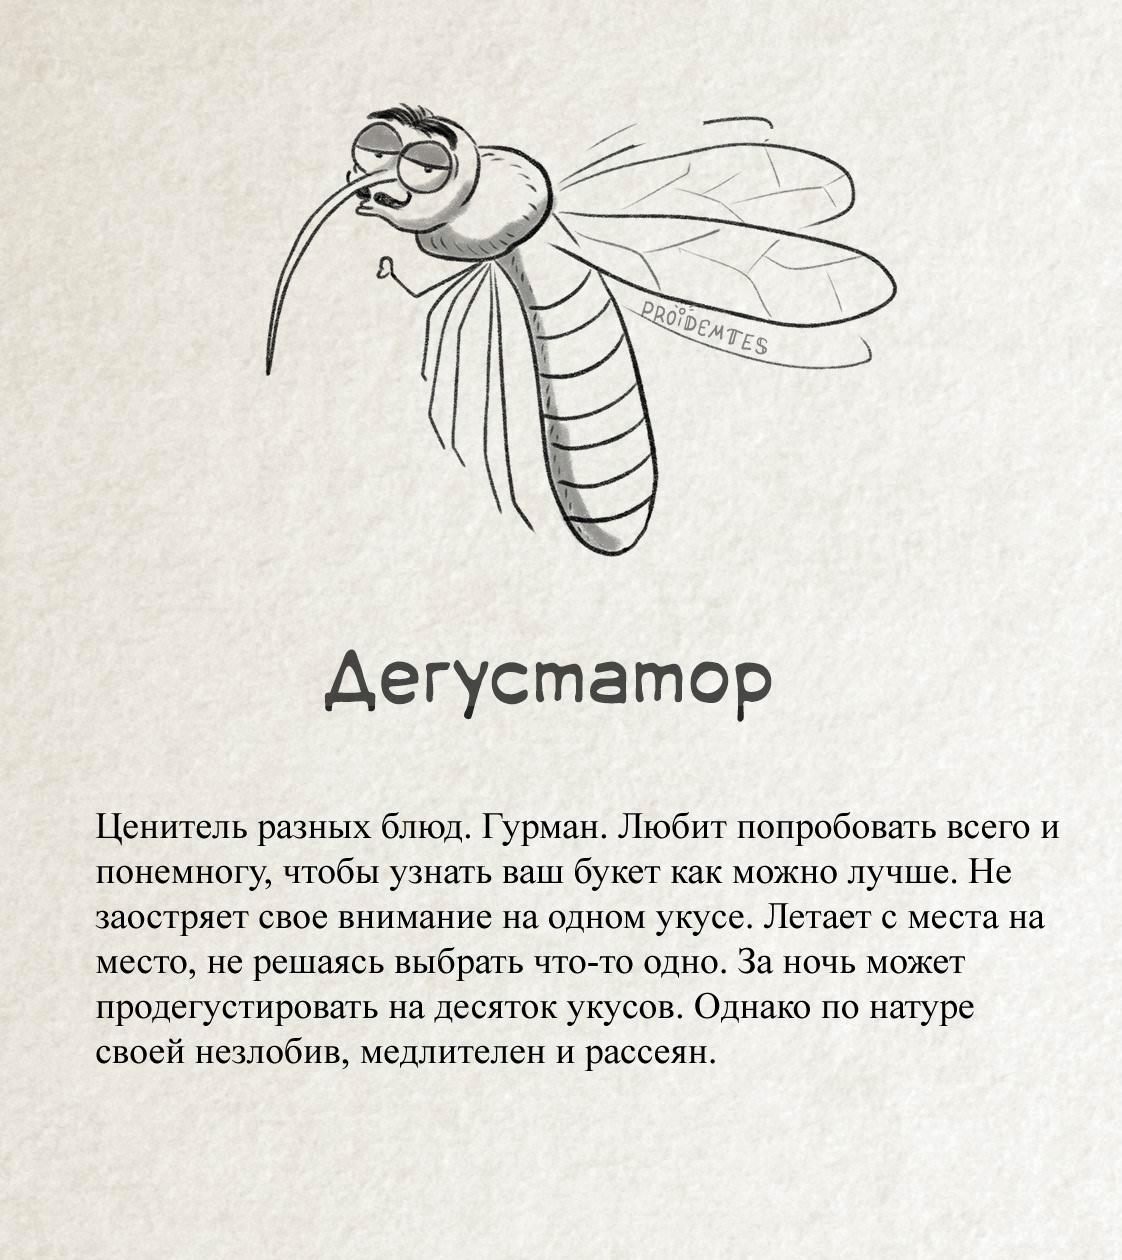 Комар - дегустатор